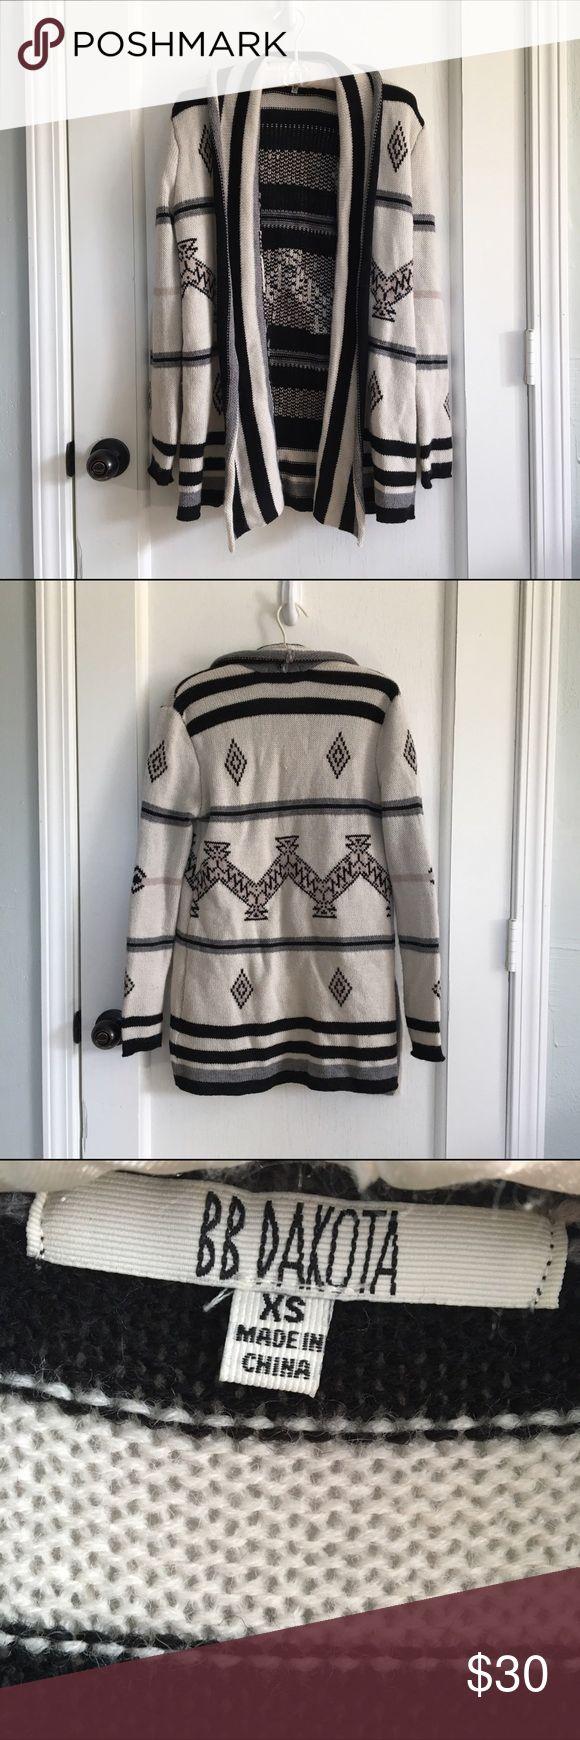 Cardigan in Aztec Print Cozy wrap cardigan in cream and white Aztec print. Oversized fit. BB Dakota Sweaters Cardigans